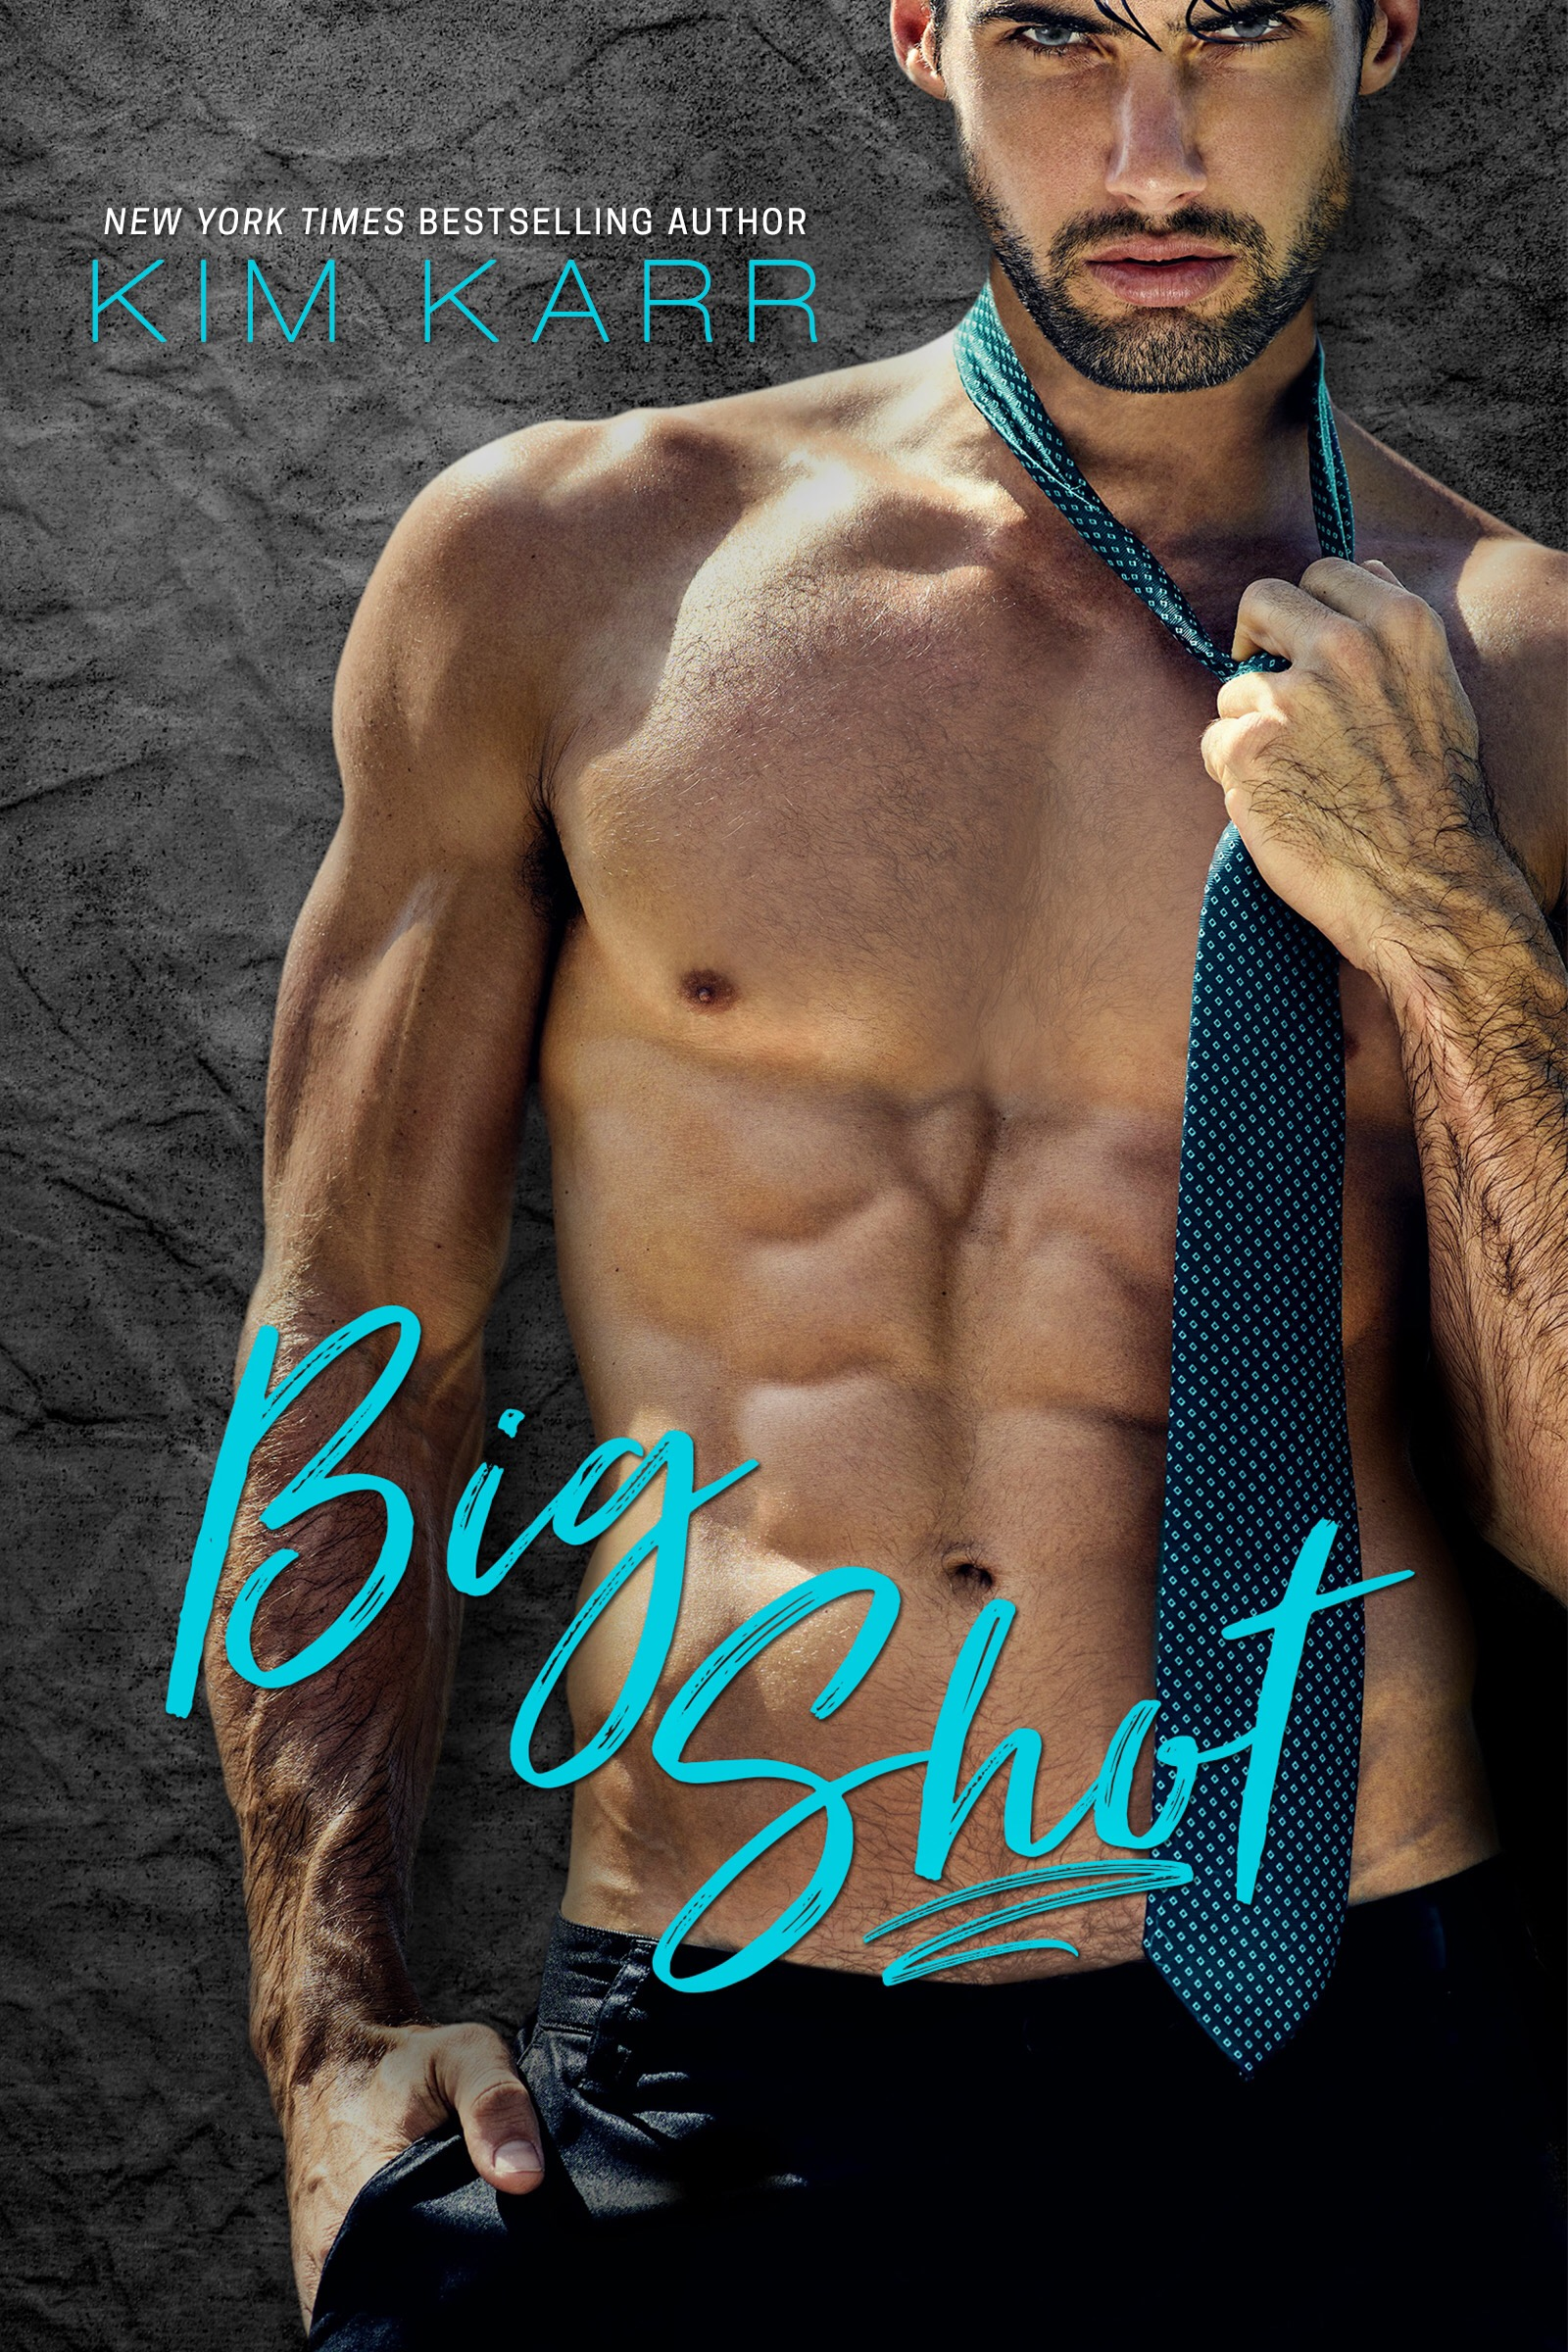 BIG SHOT by Kim Karr